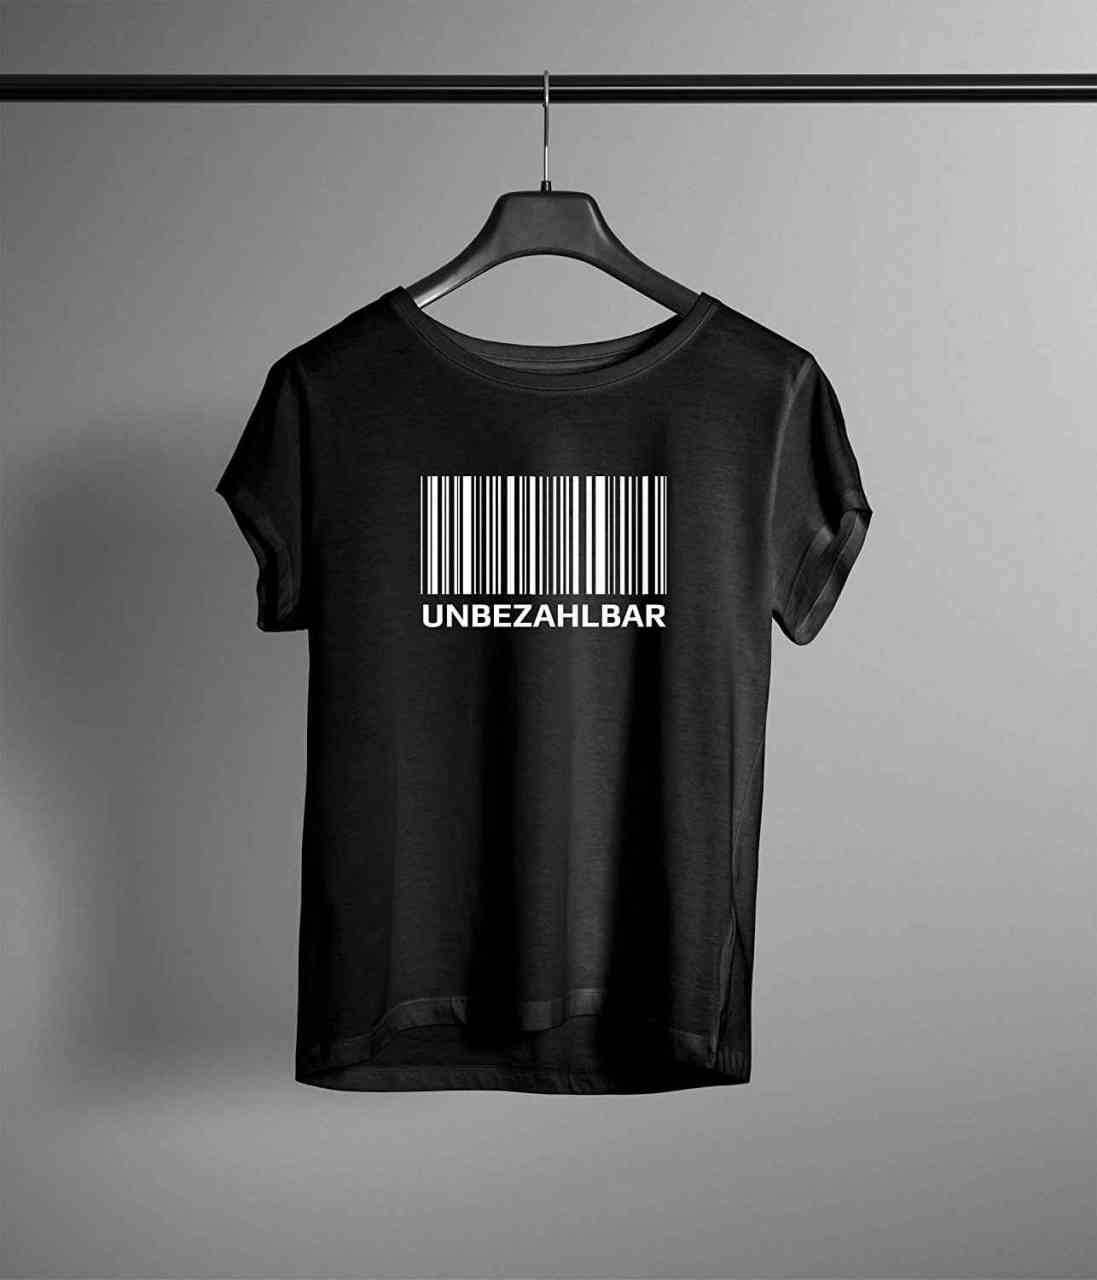 Unbezahlbar Barcode T-Shirt | Männer oder Frauen (Unisex) | Lustig | Funny